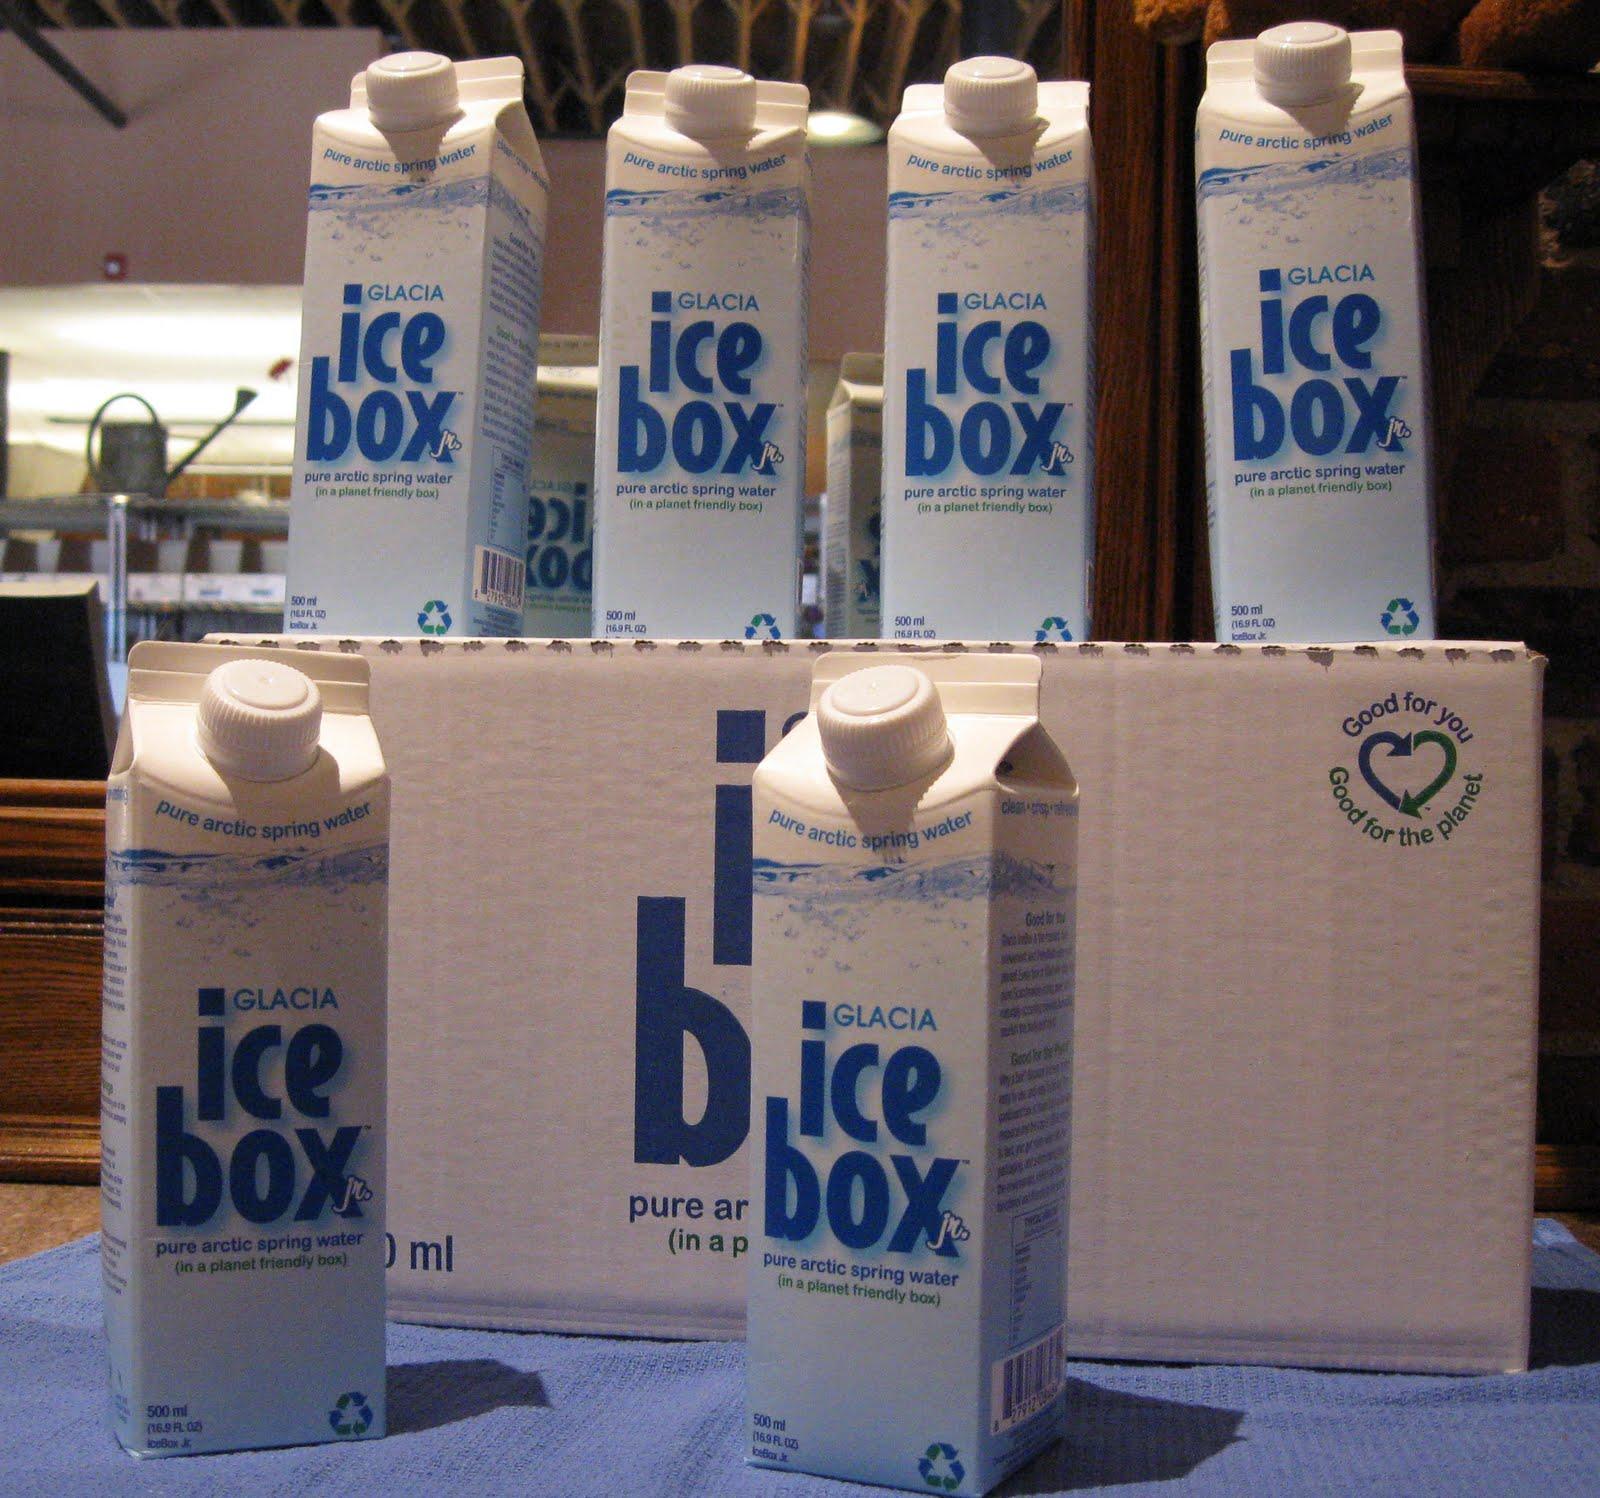 Licorice International Blog Glacia Icebox Pure Arctic